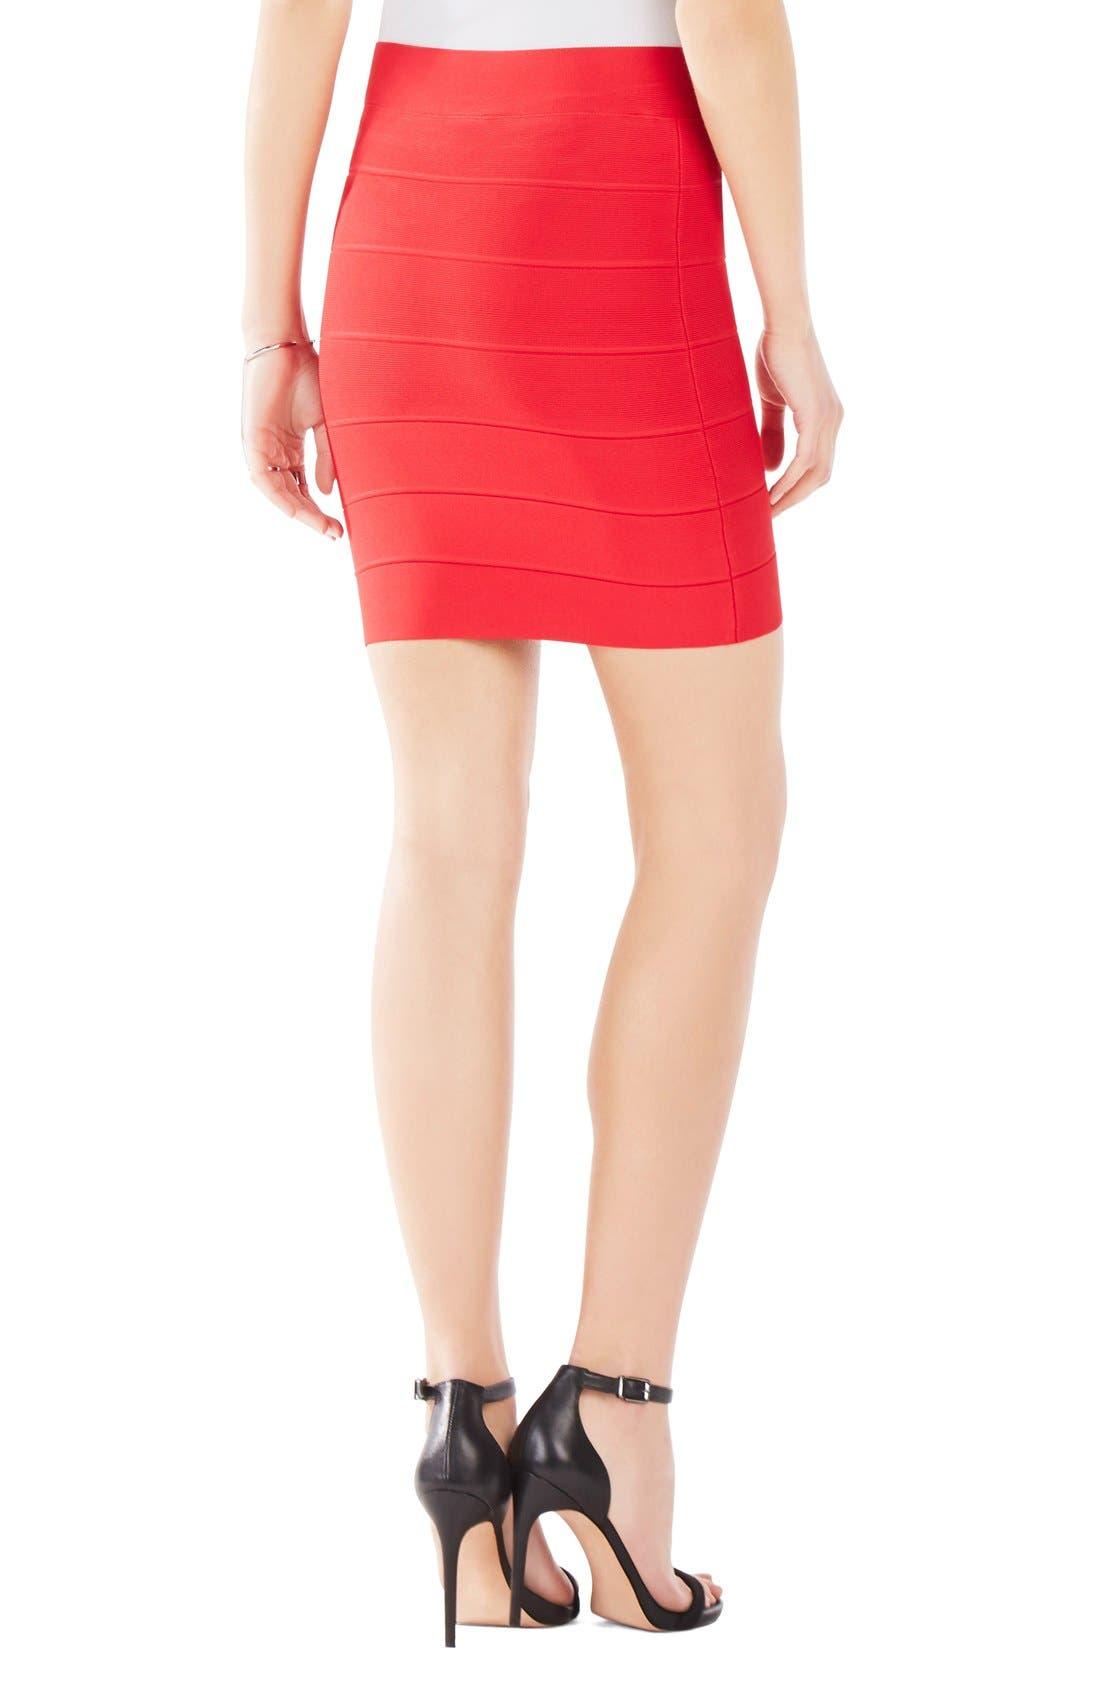 Alternate Image 2  - BCBGMAXAZRIA 'Simone' Bandage Knit Pencil Skirt